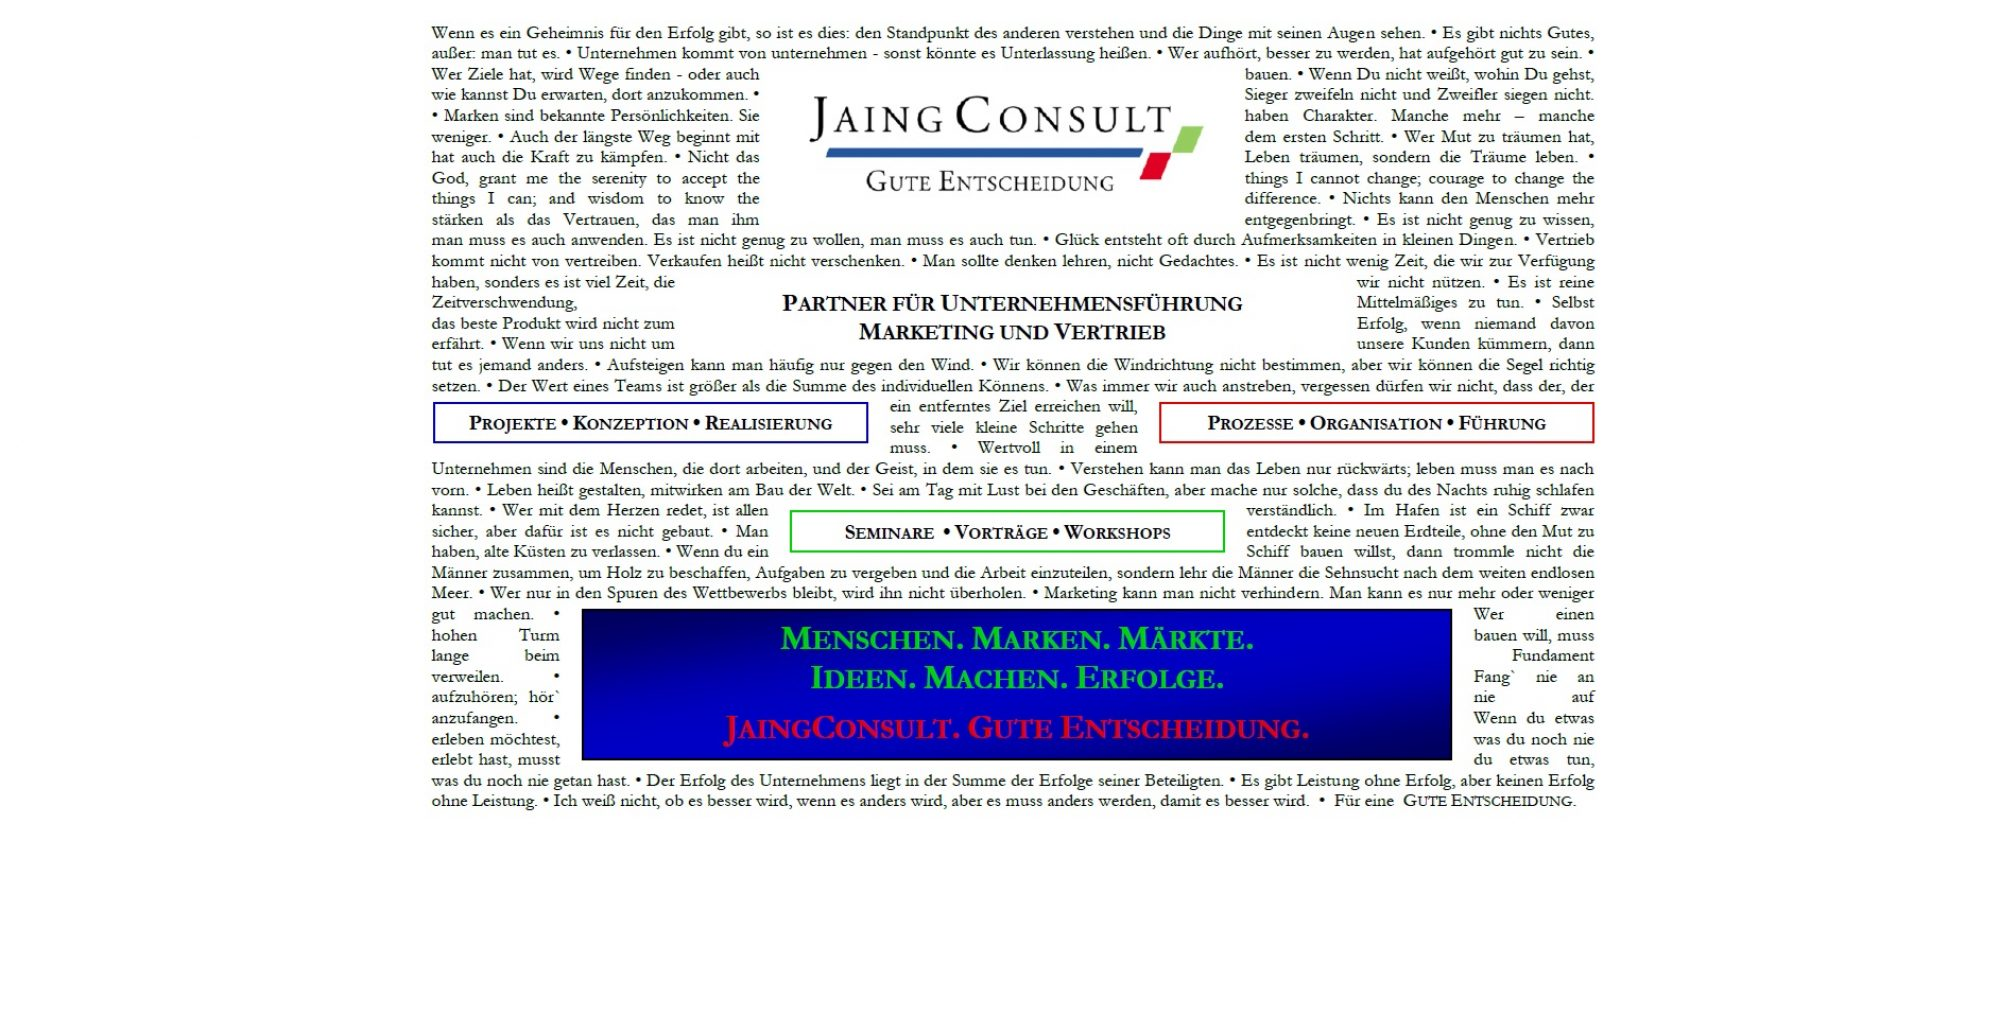 jaingconsult